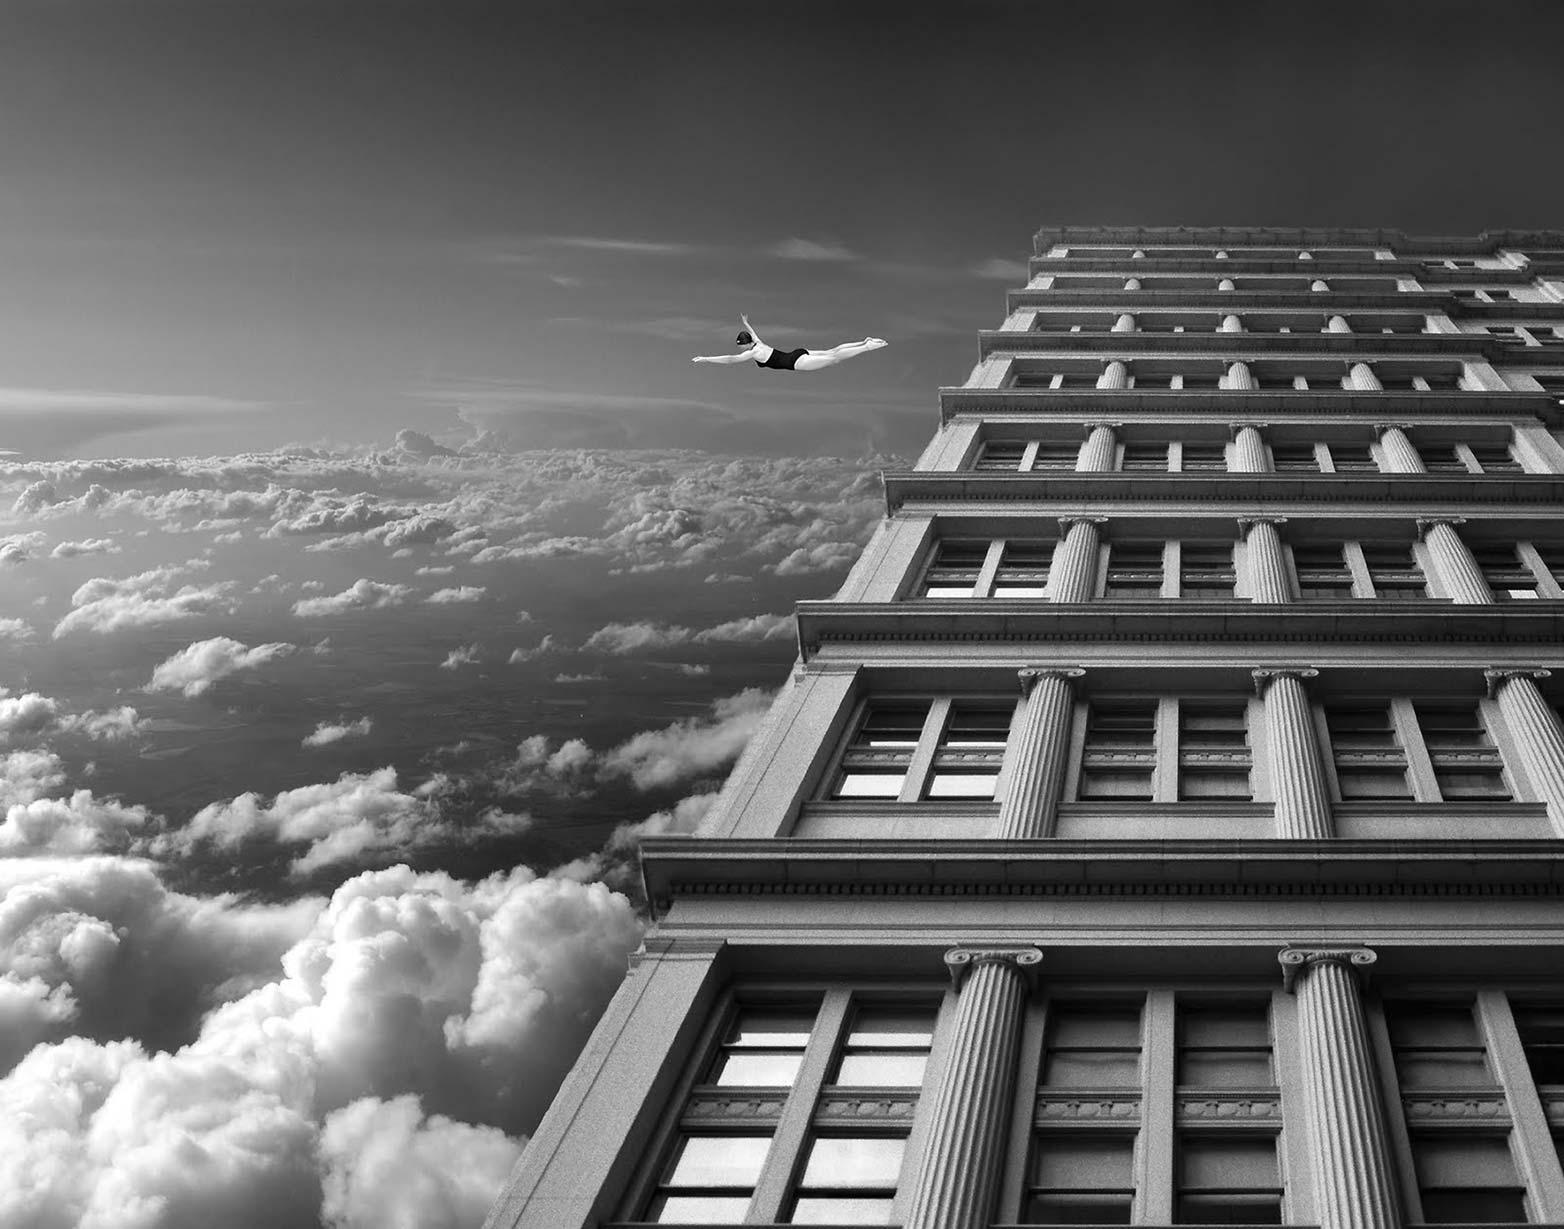 Thomas Barbèy, fotomontaggi surreali in bianco e nero